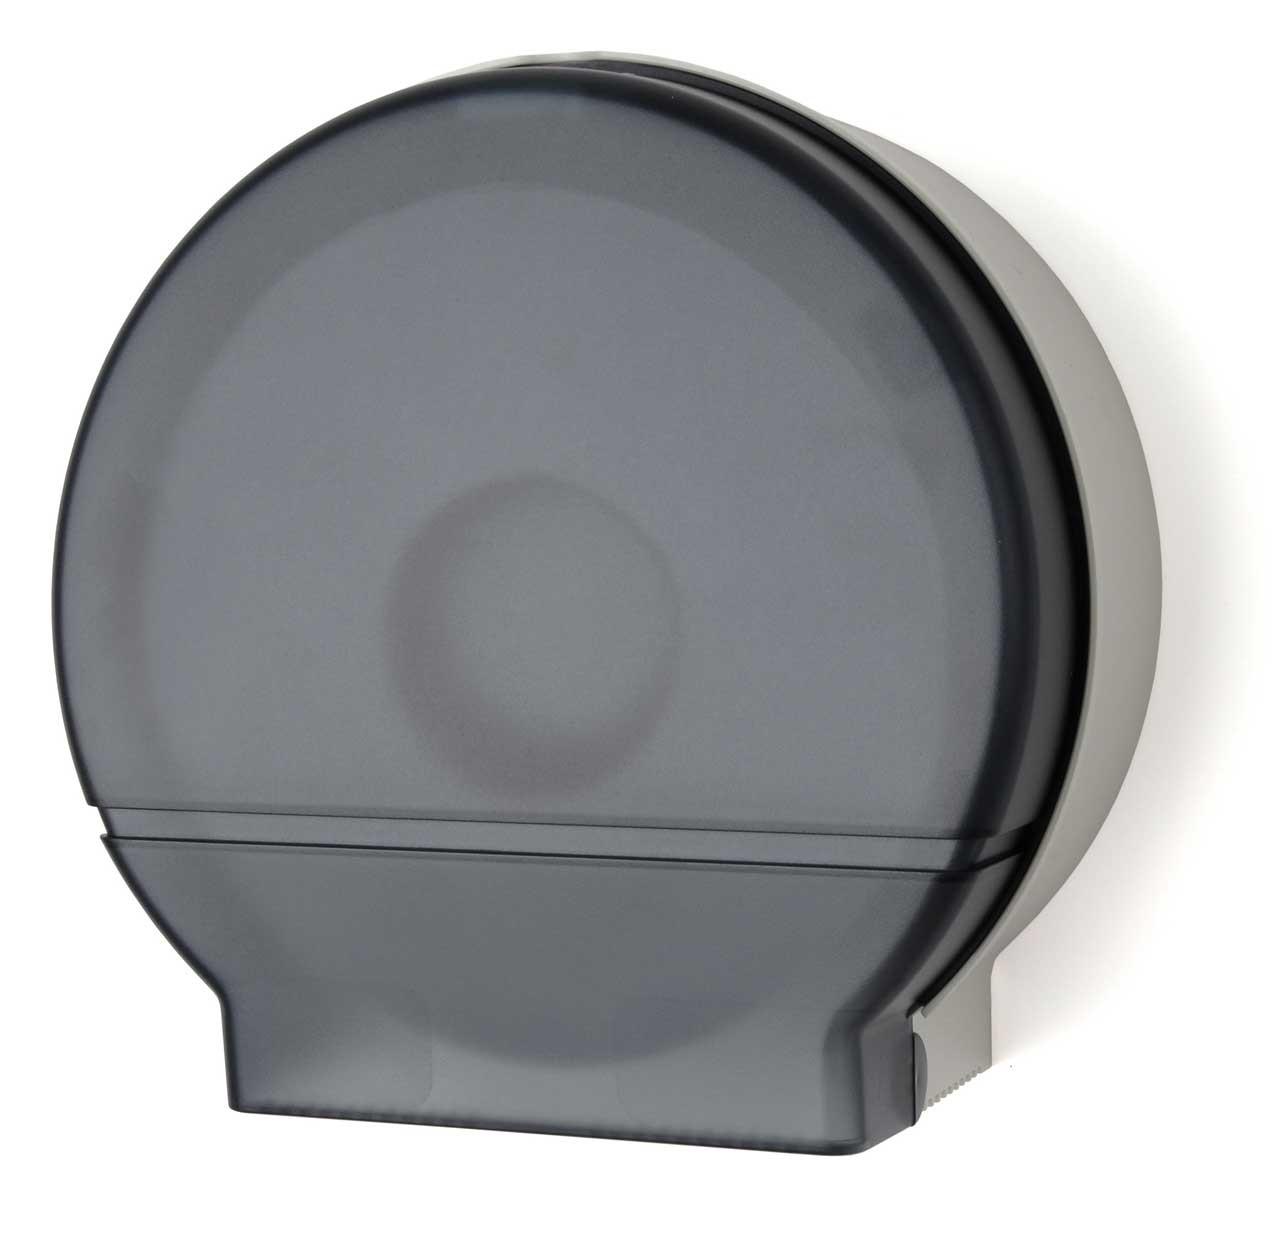 Palmer Fixture R26 Single 9 Quot Jumbo Roll Toilet Tissue